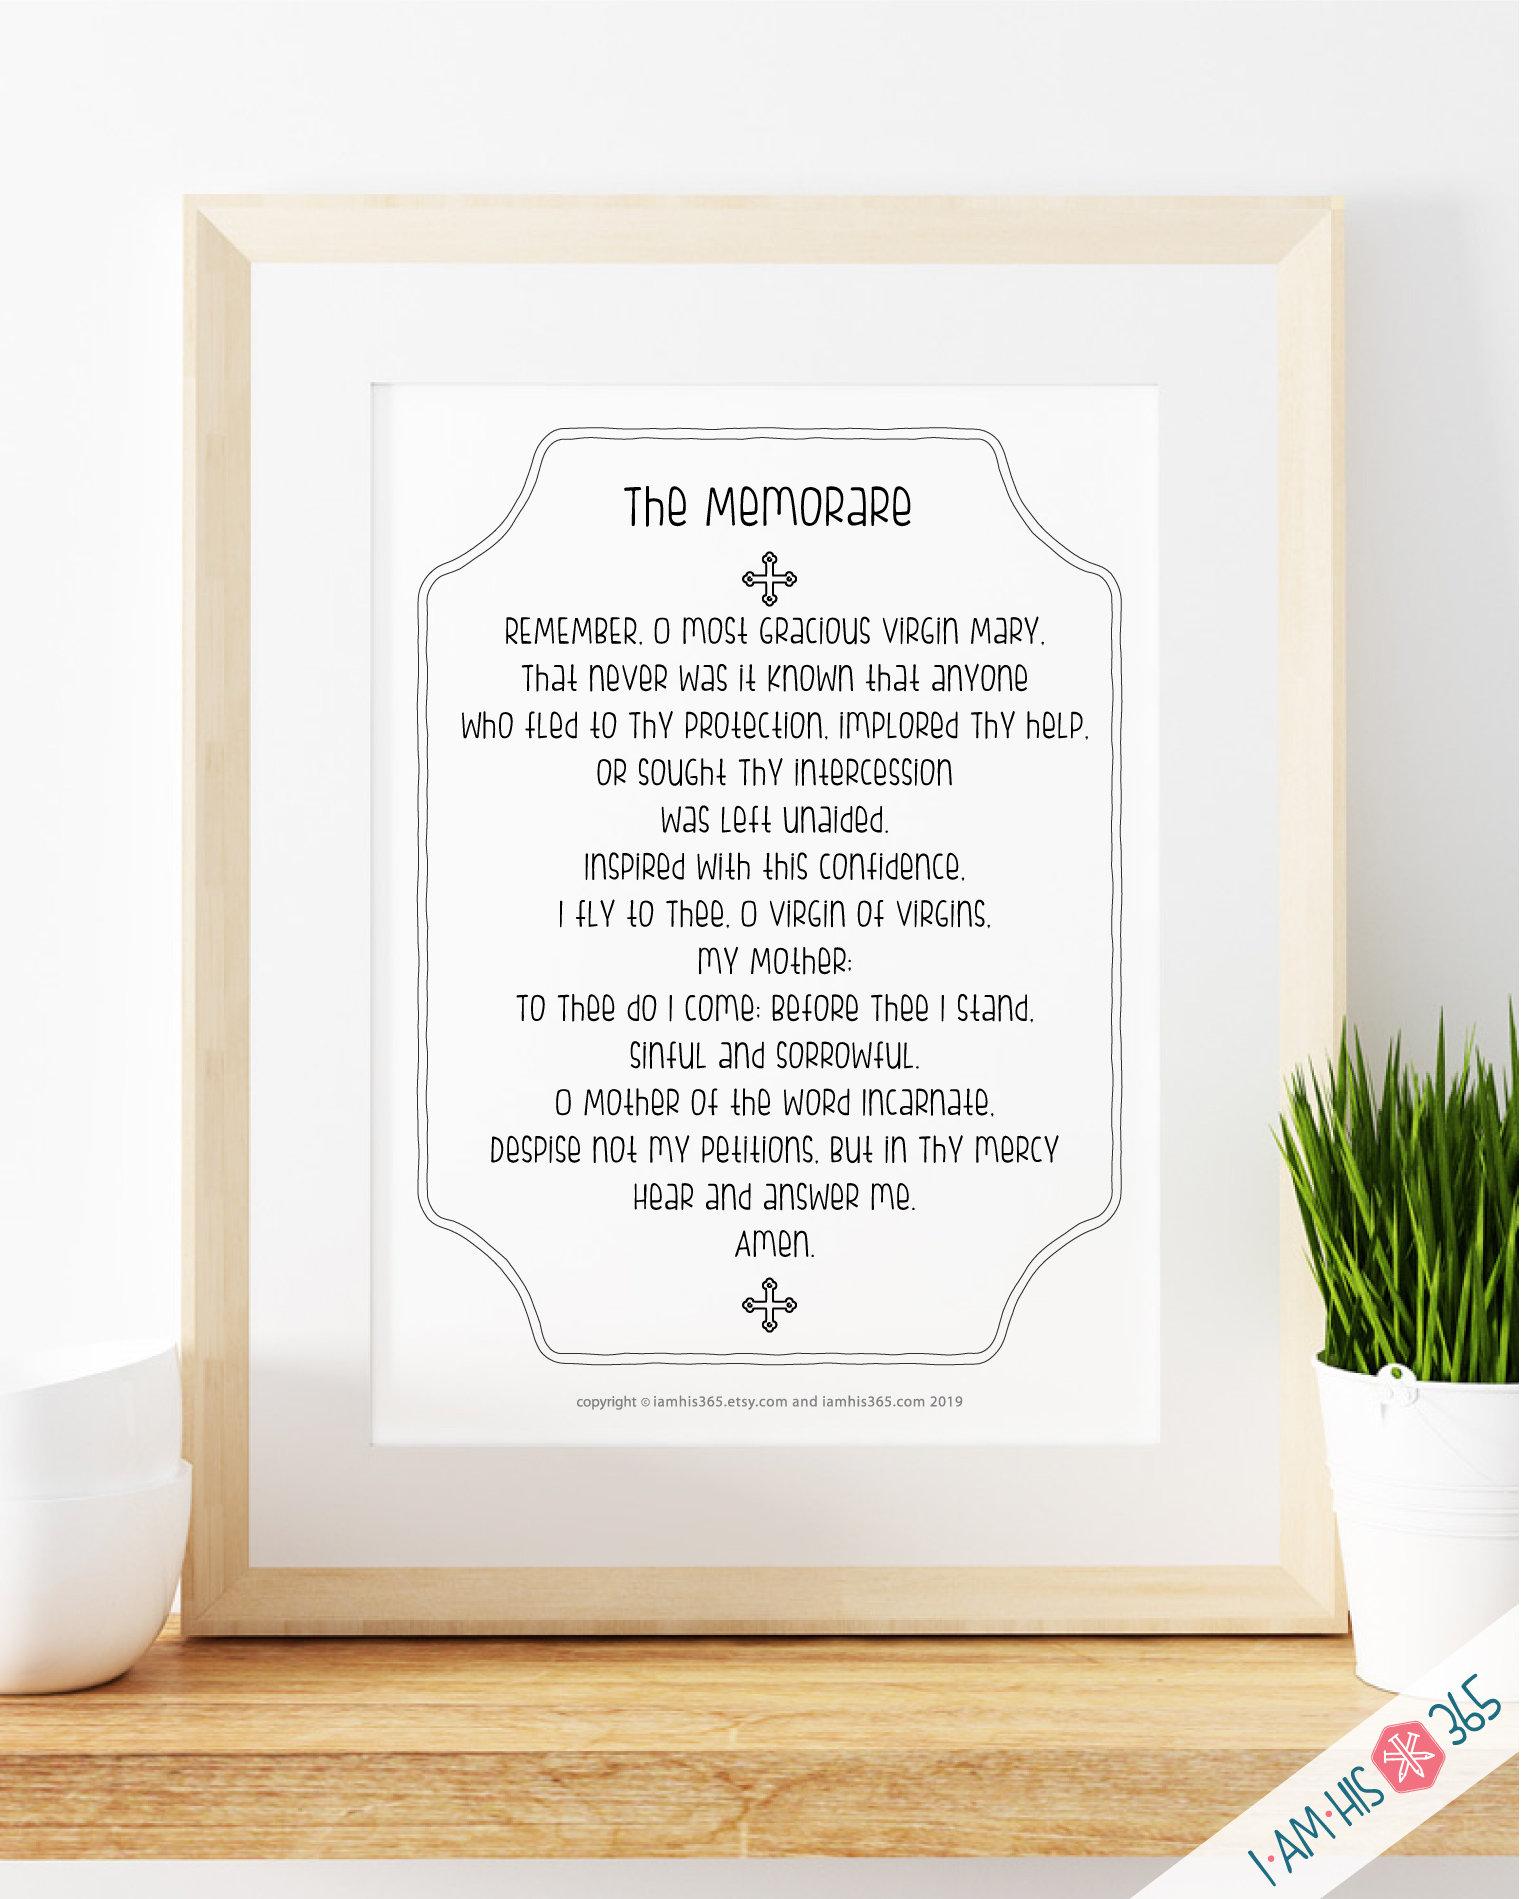 photo relating to Memorare Prayer Printable identify Memorare Prayer Print - Catholic Prayer Printable Christian